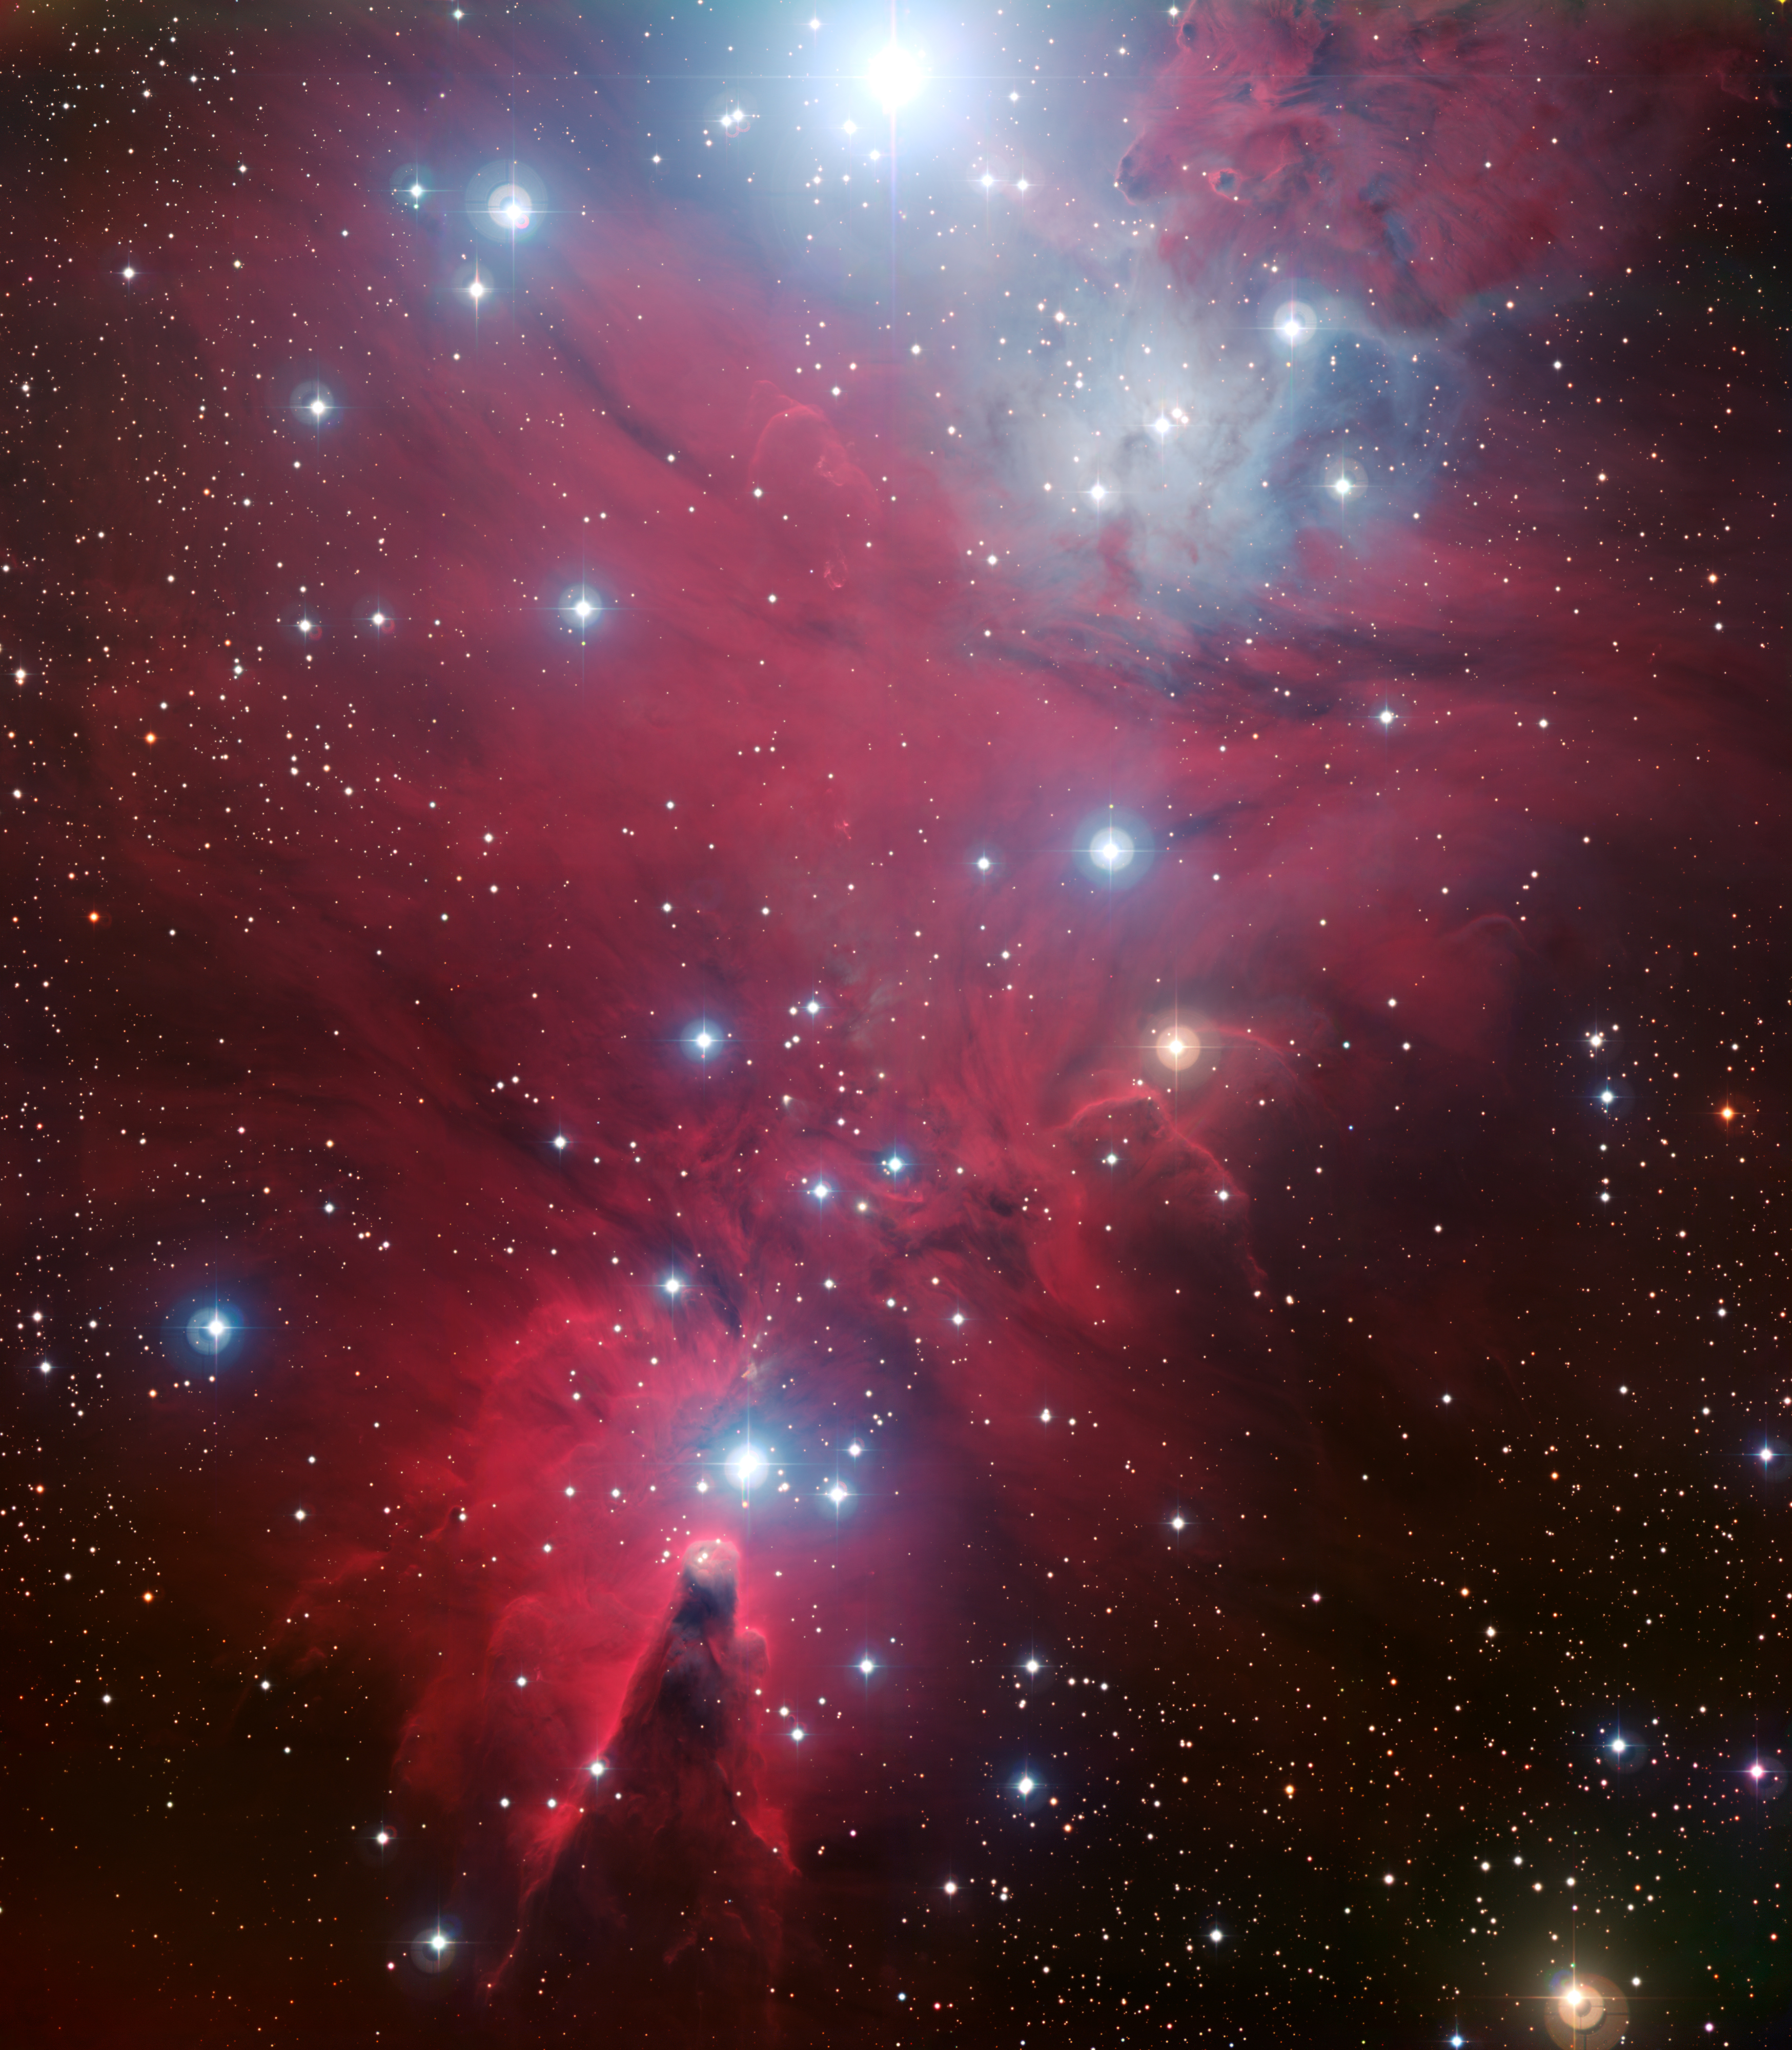 NGC 2264 وعنقود شجرة الميلاد